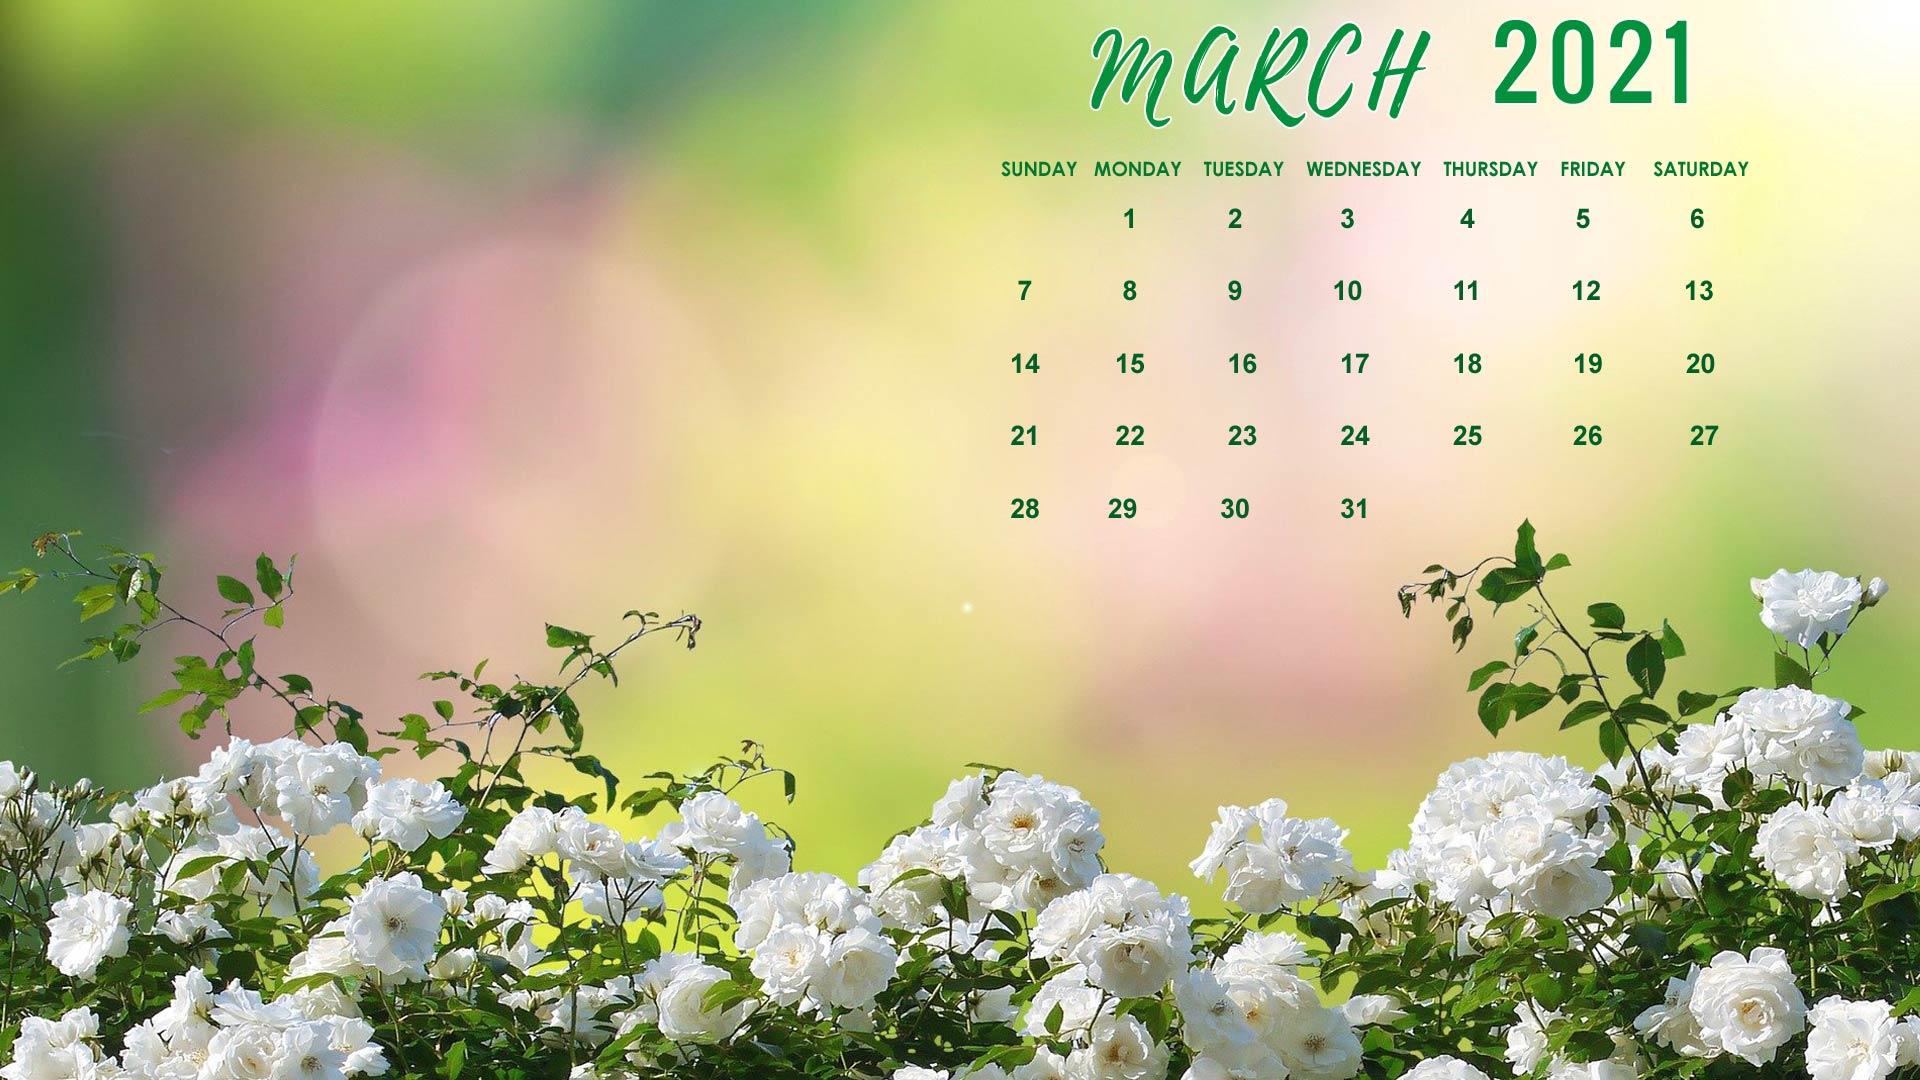 Cute Decorative March 2021 Calendar Wallpaper For Desktop, Laptop